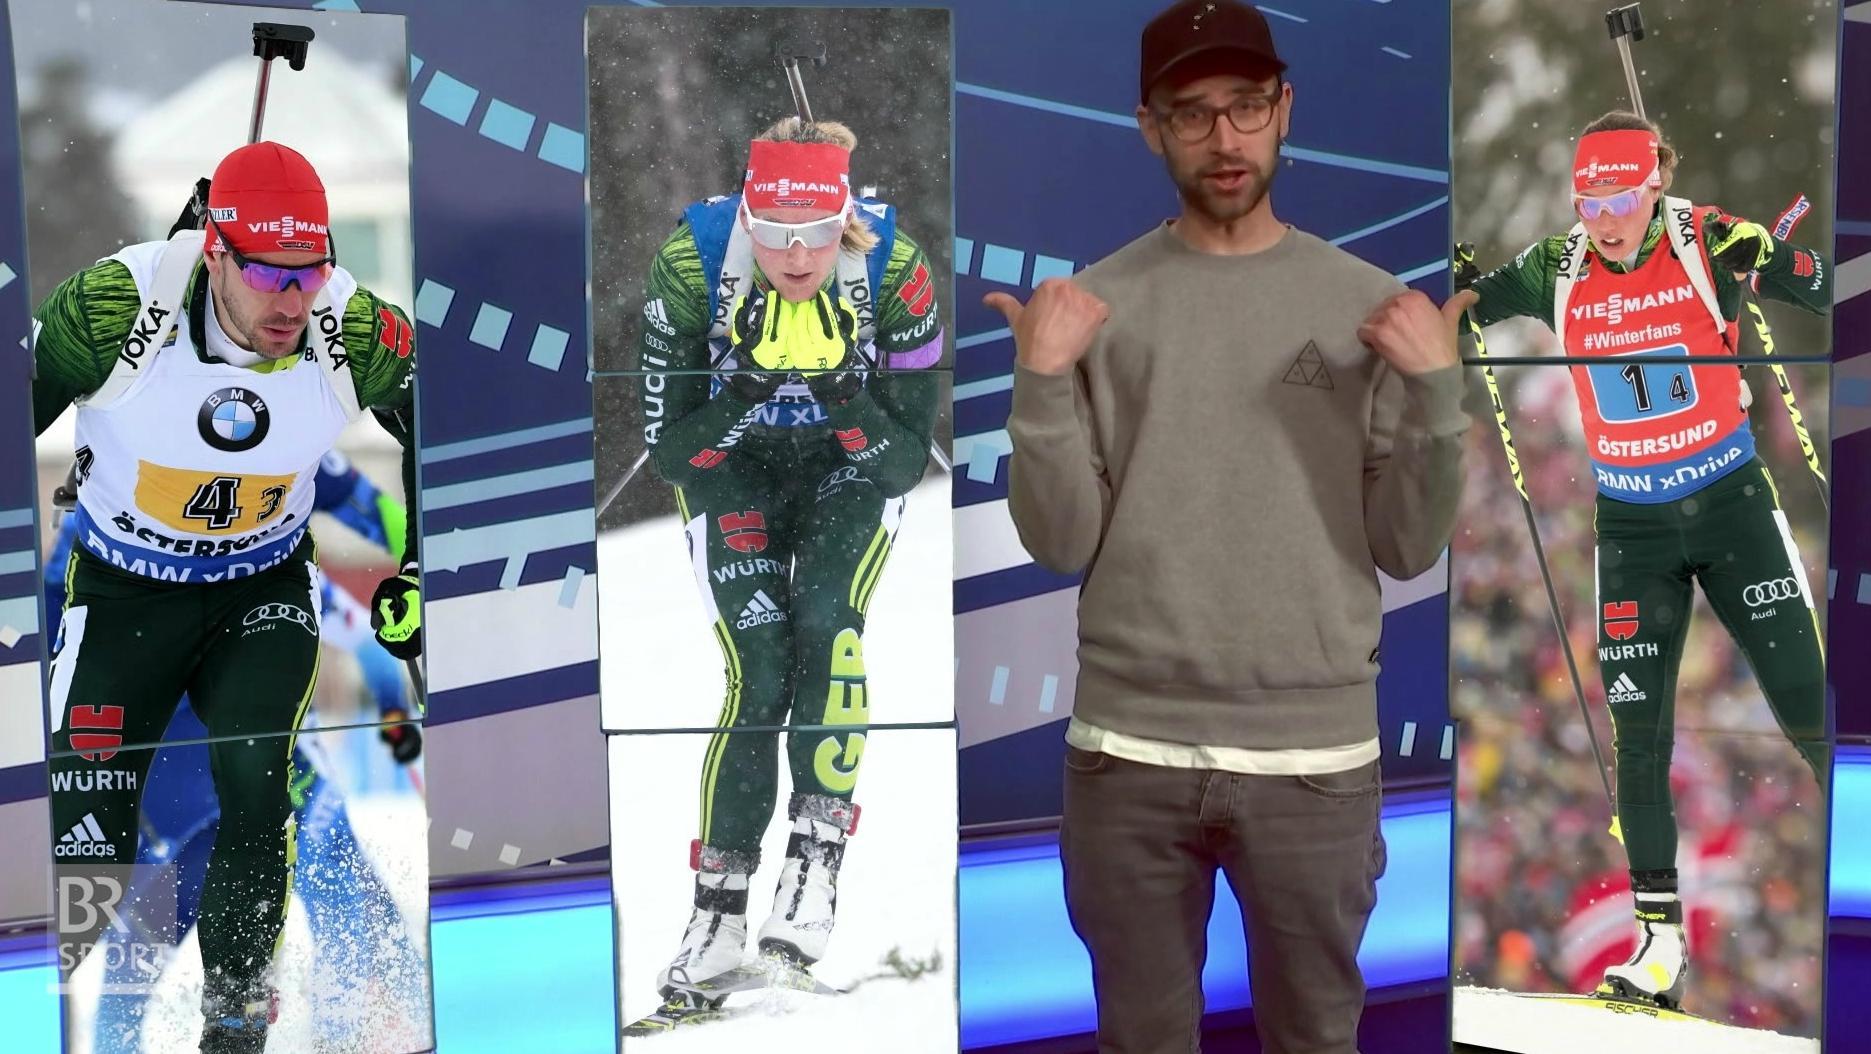 Lukas Schönmüller präsentiert den bayerischen Sport-Wochenrückblick